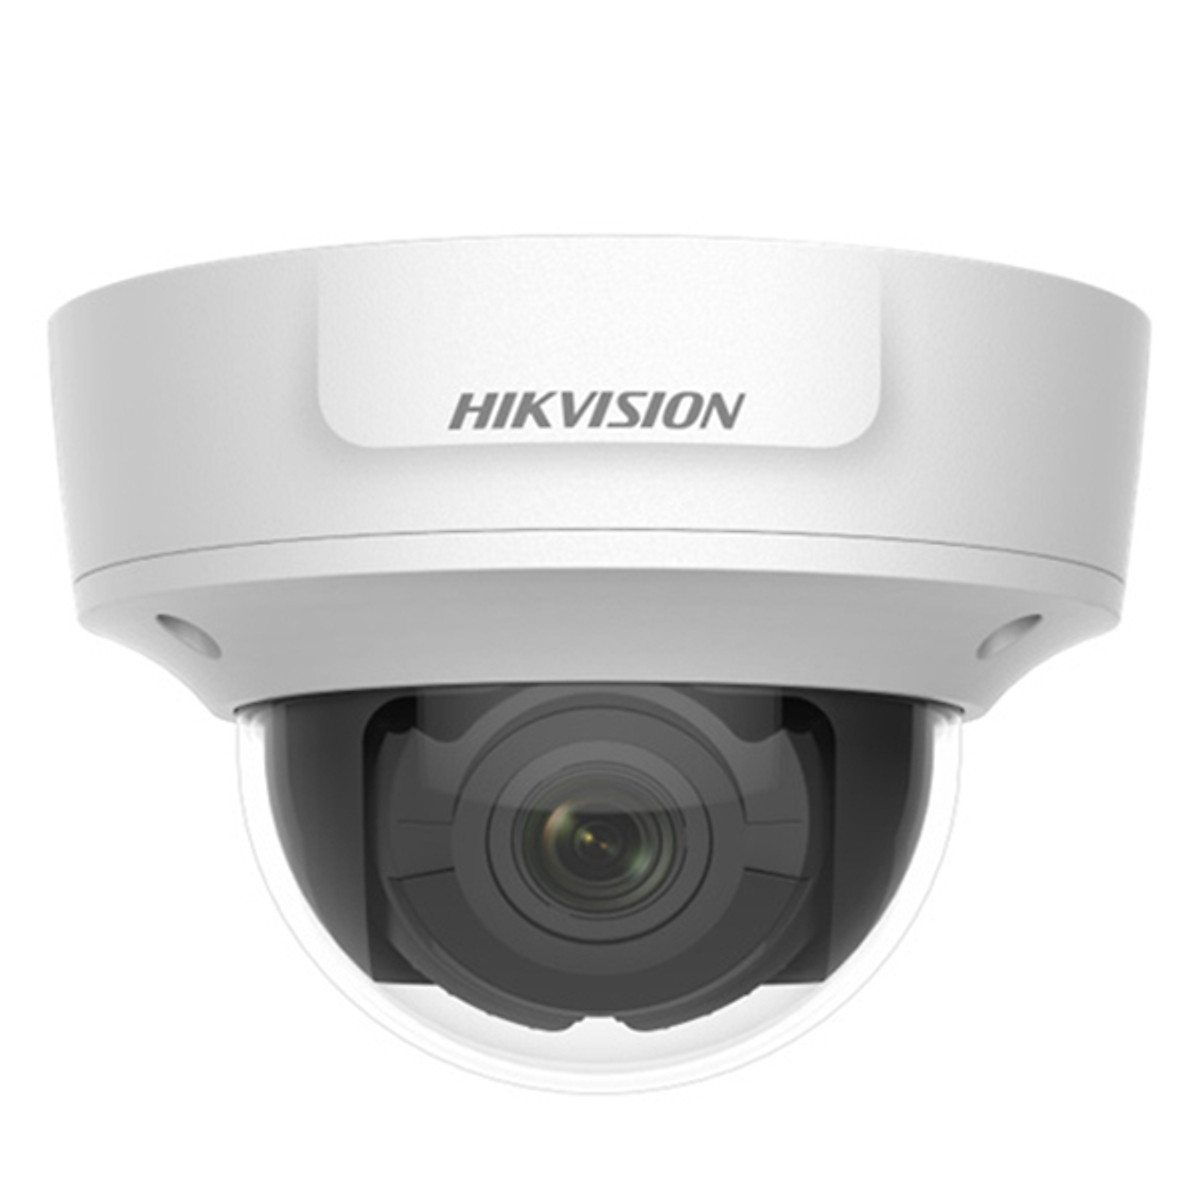 Camera IP HIKVISION DS-2CD2721G0-I 2.0 Megapixel – Hàng Nhập Khẩu